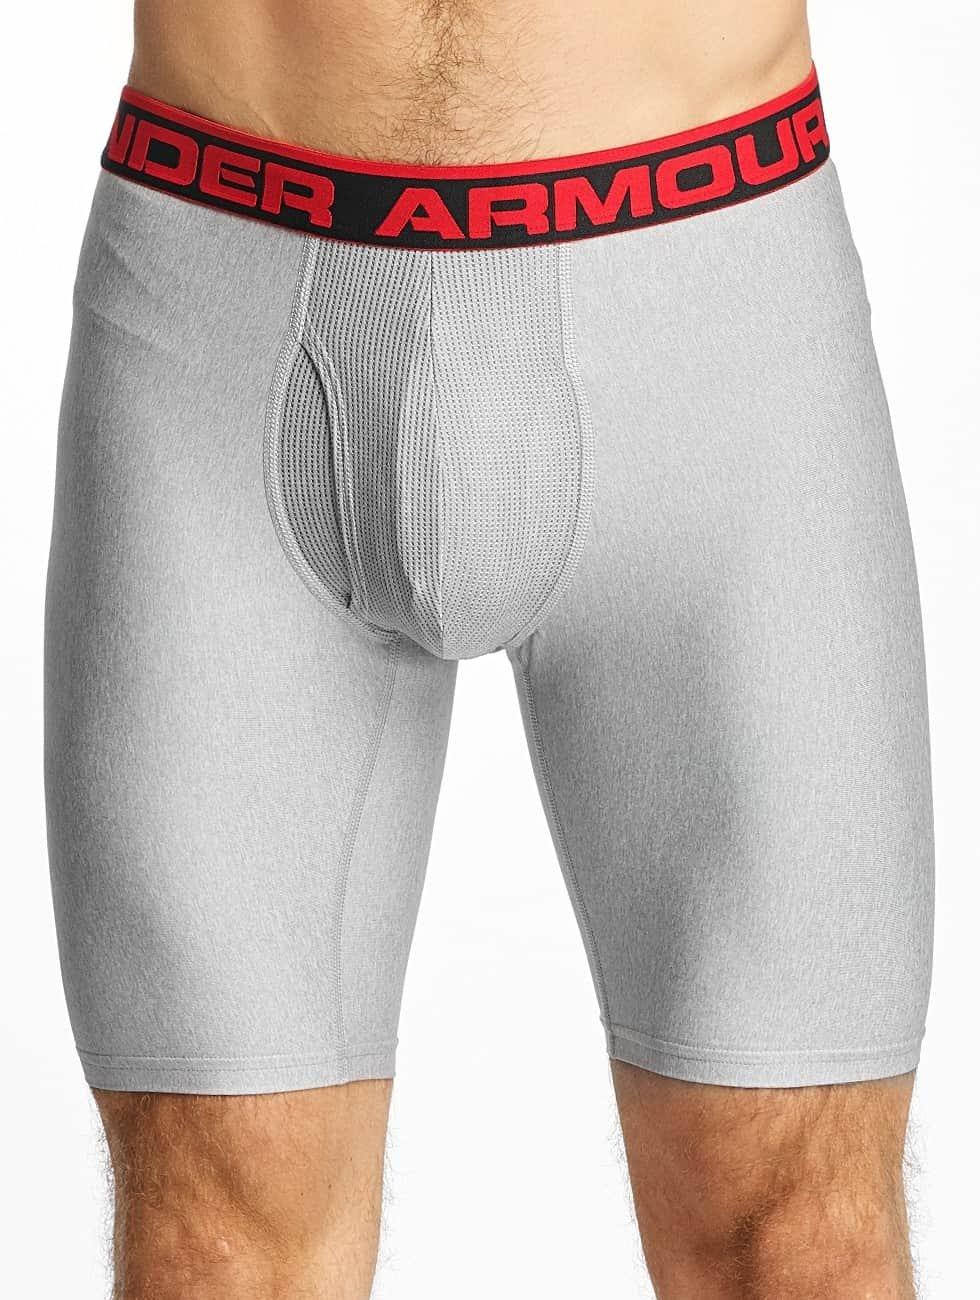 Under Armour Boxershorts The Original 9'' grau